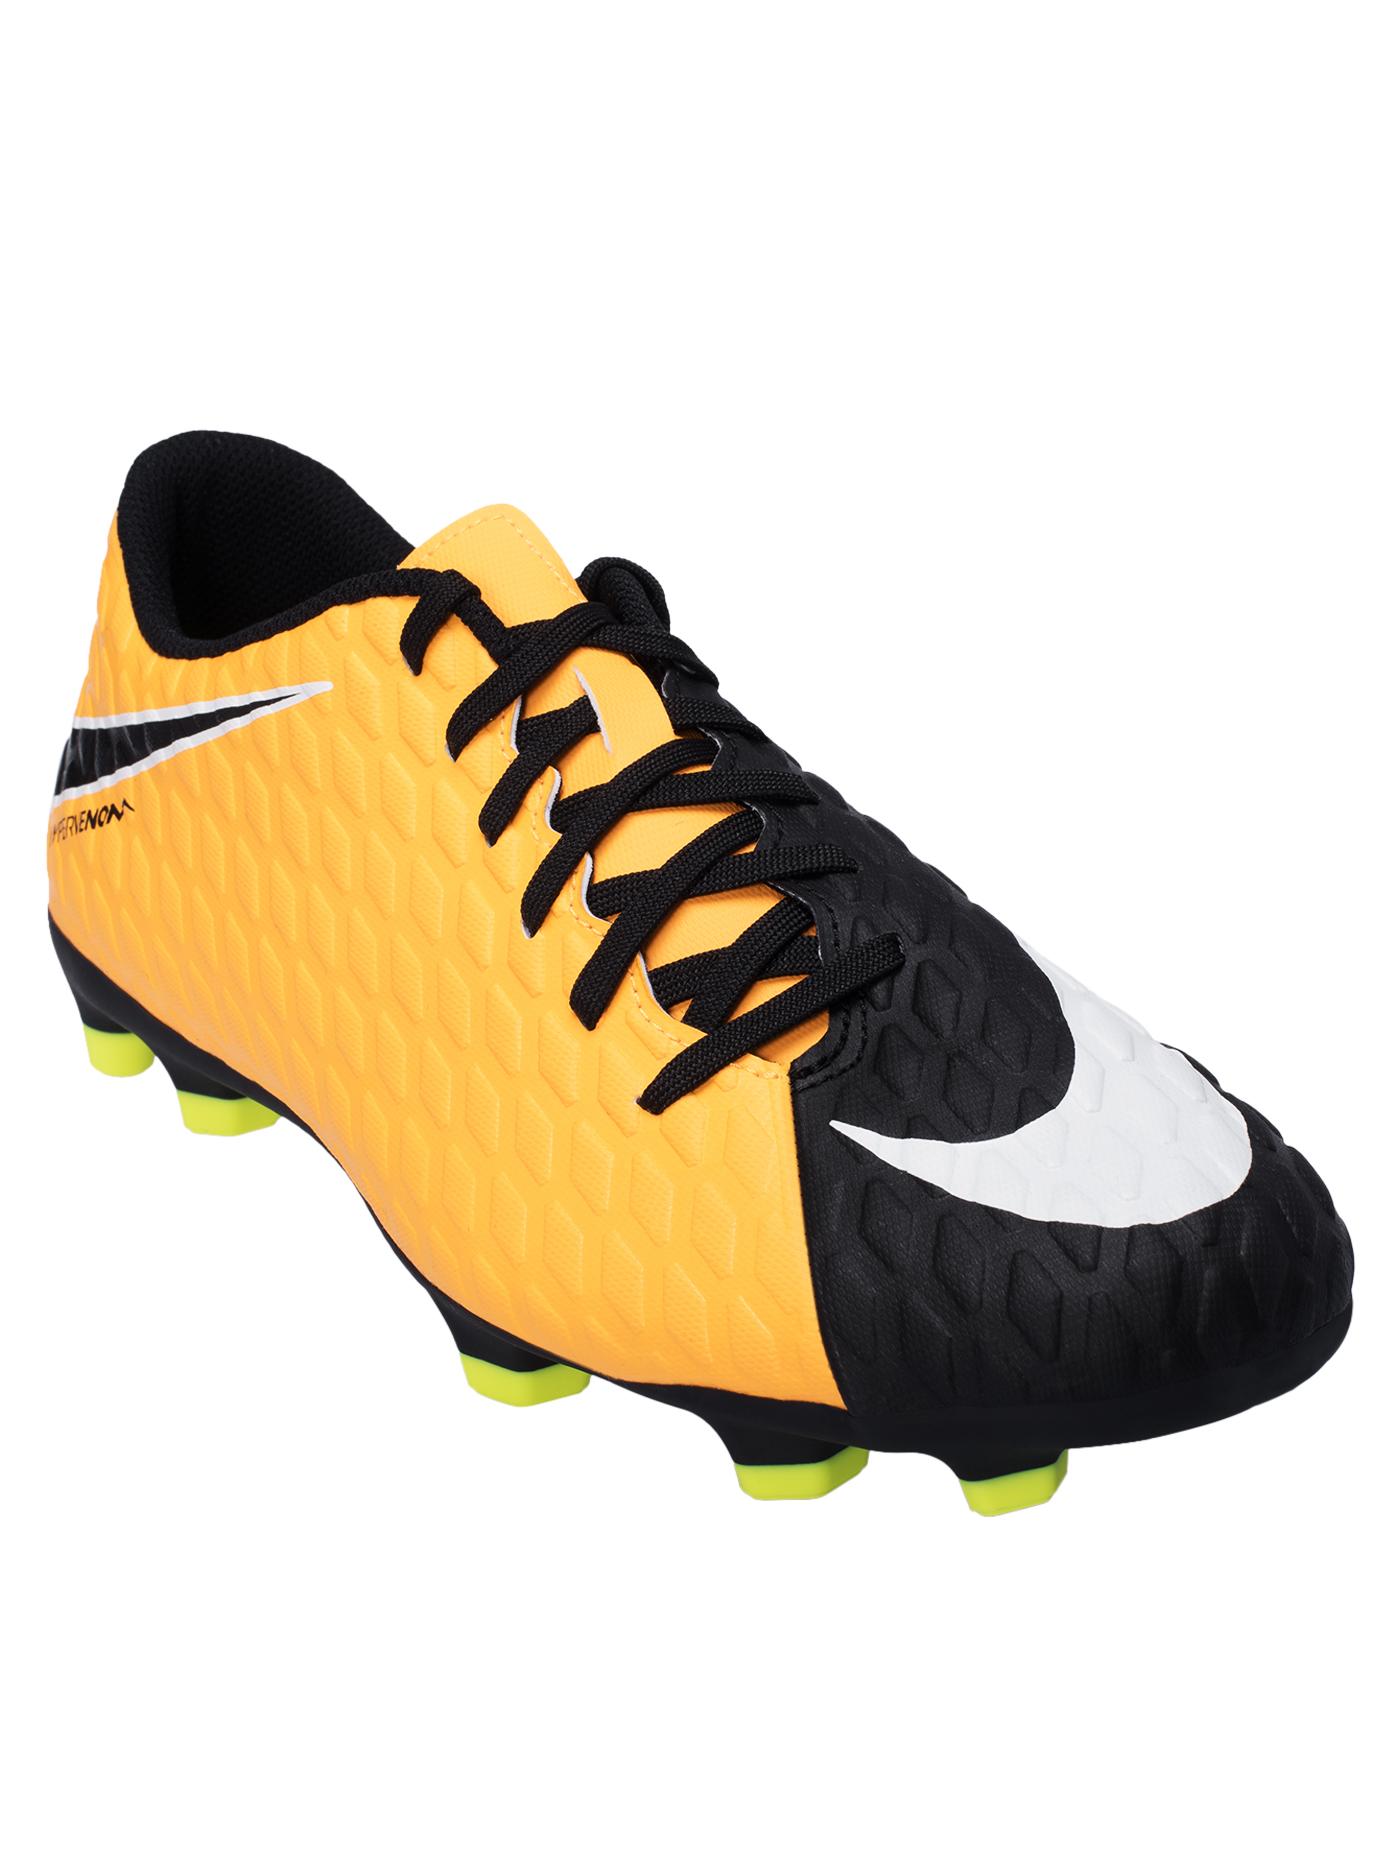 0ac41a7b0 NIKE Men's Football Shoes Hypervenom Phade III FG 852547-801 Size US7 Orange